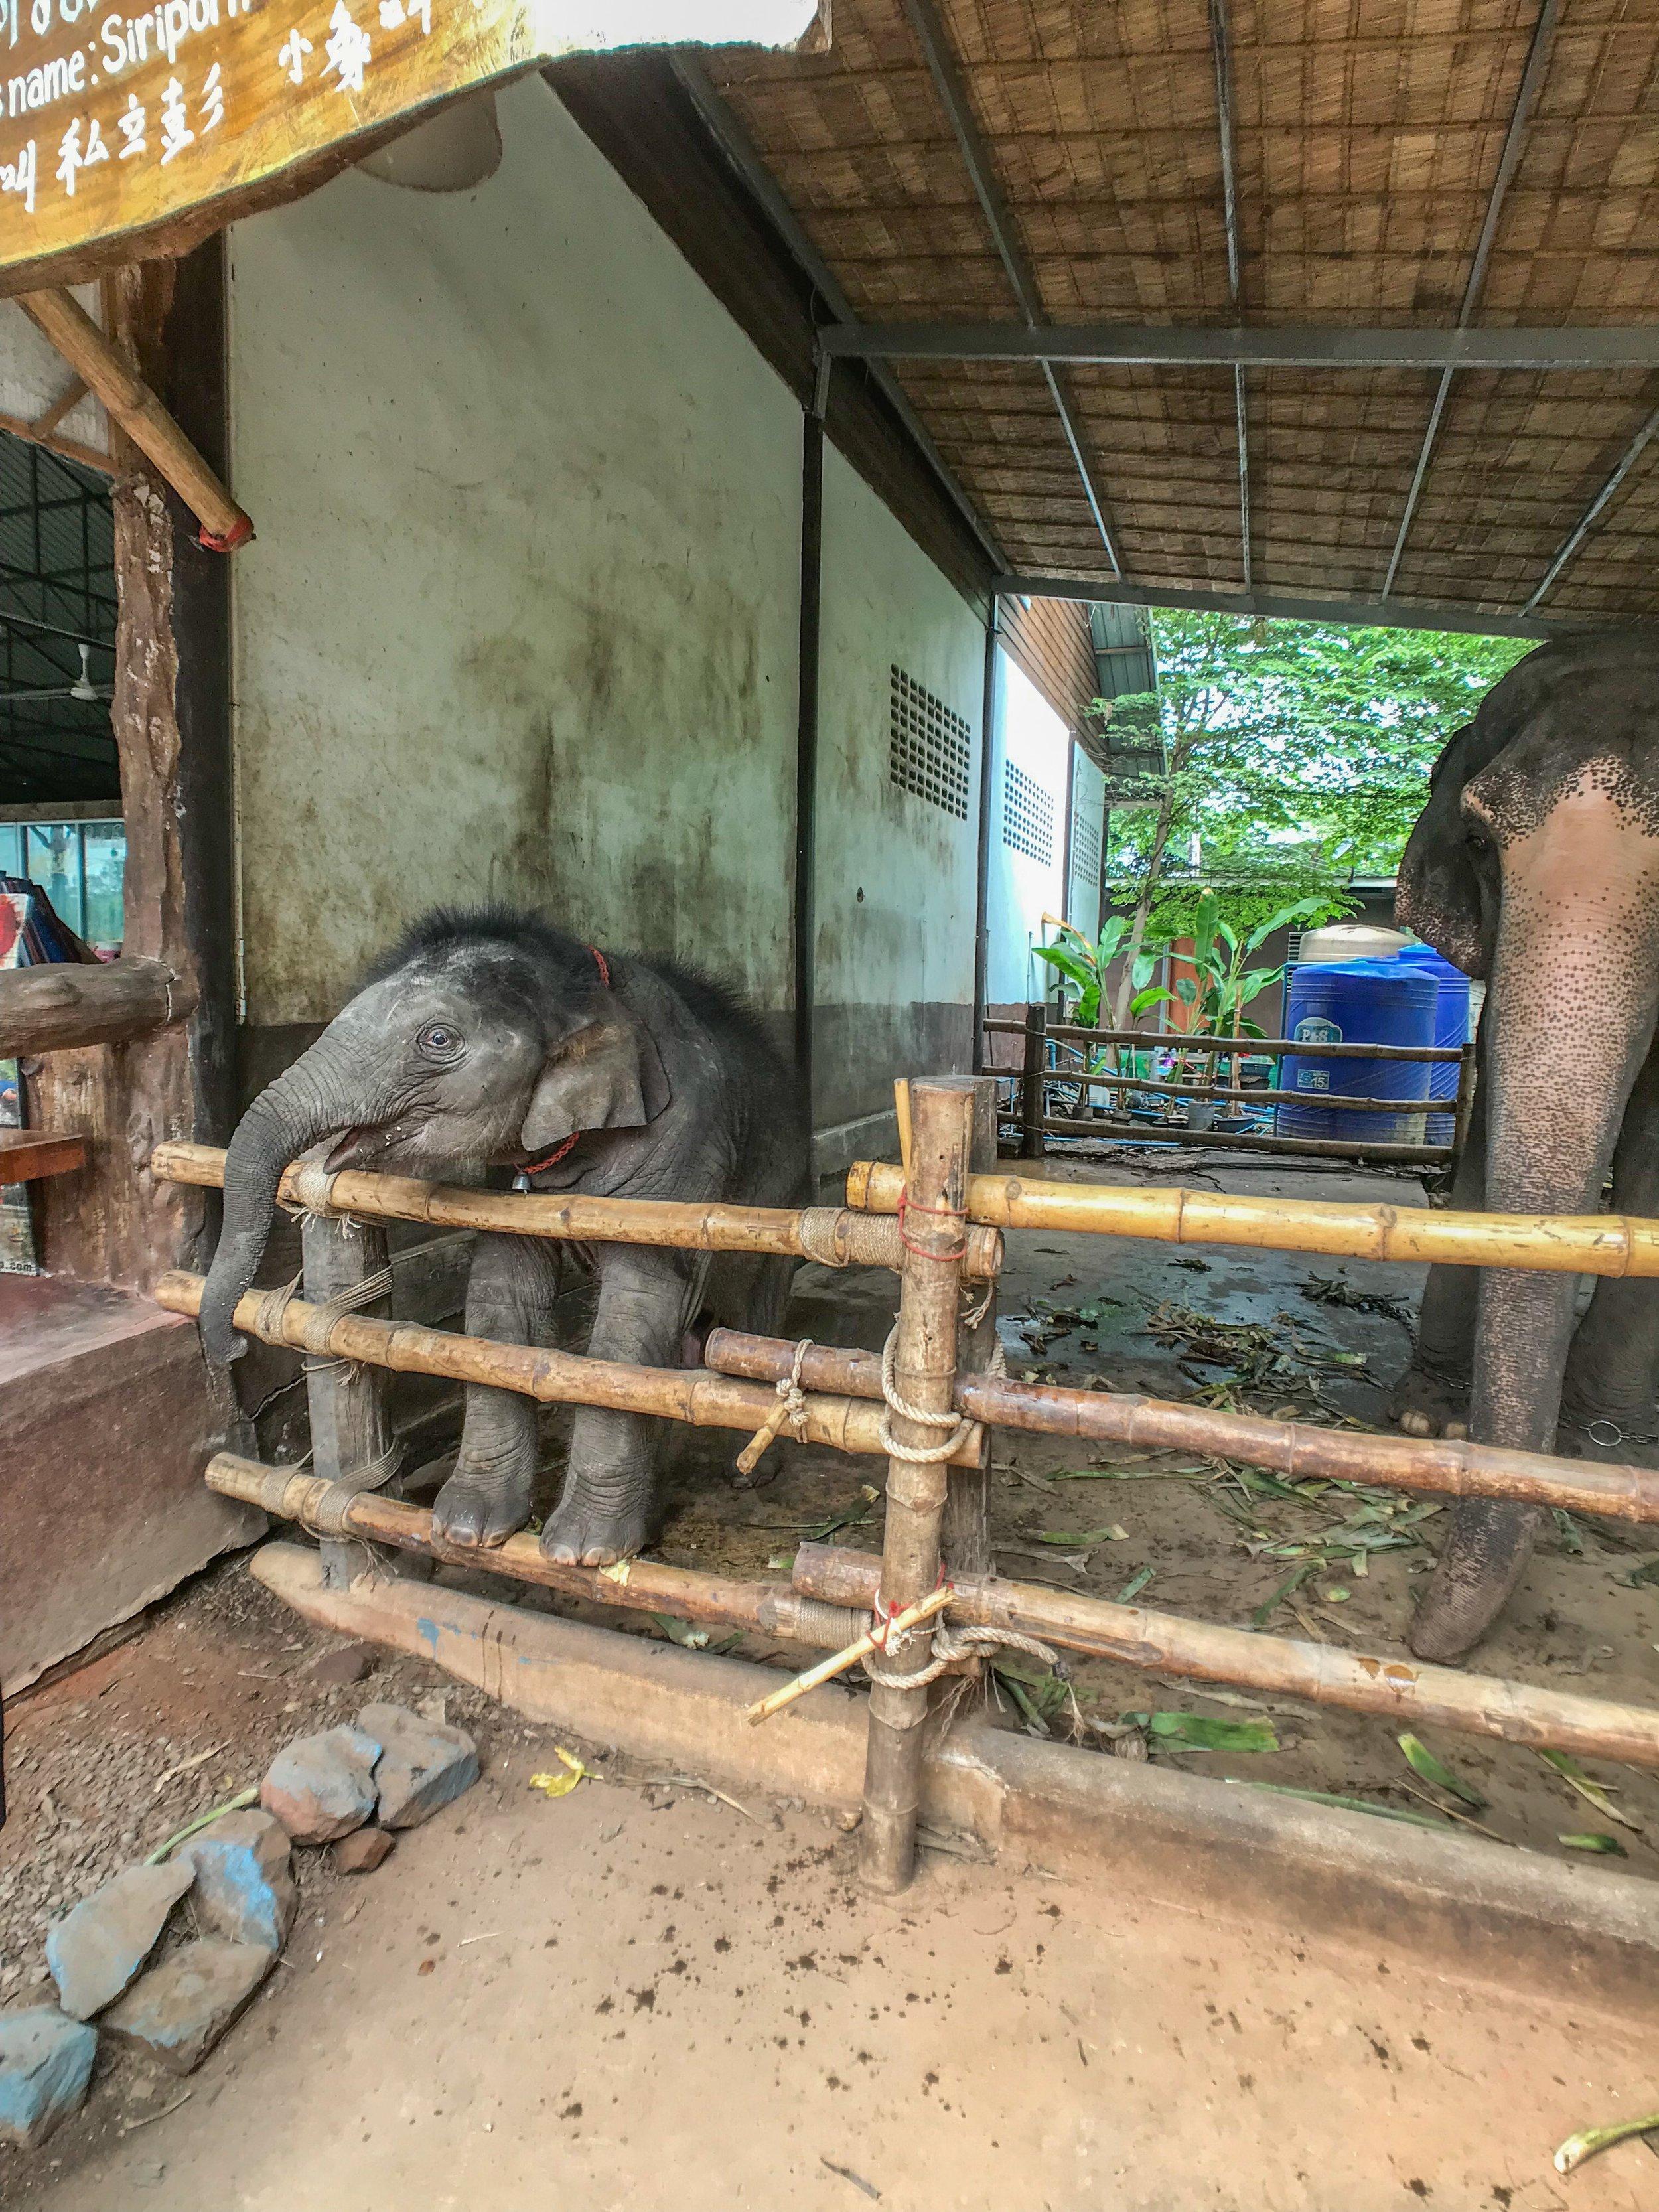 Unable to avoid animal cruelty - enslaved elephants outside the Karen Village